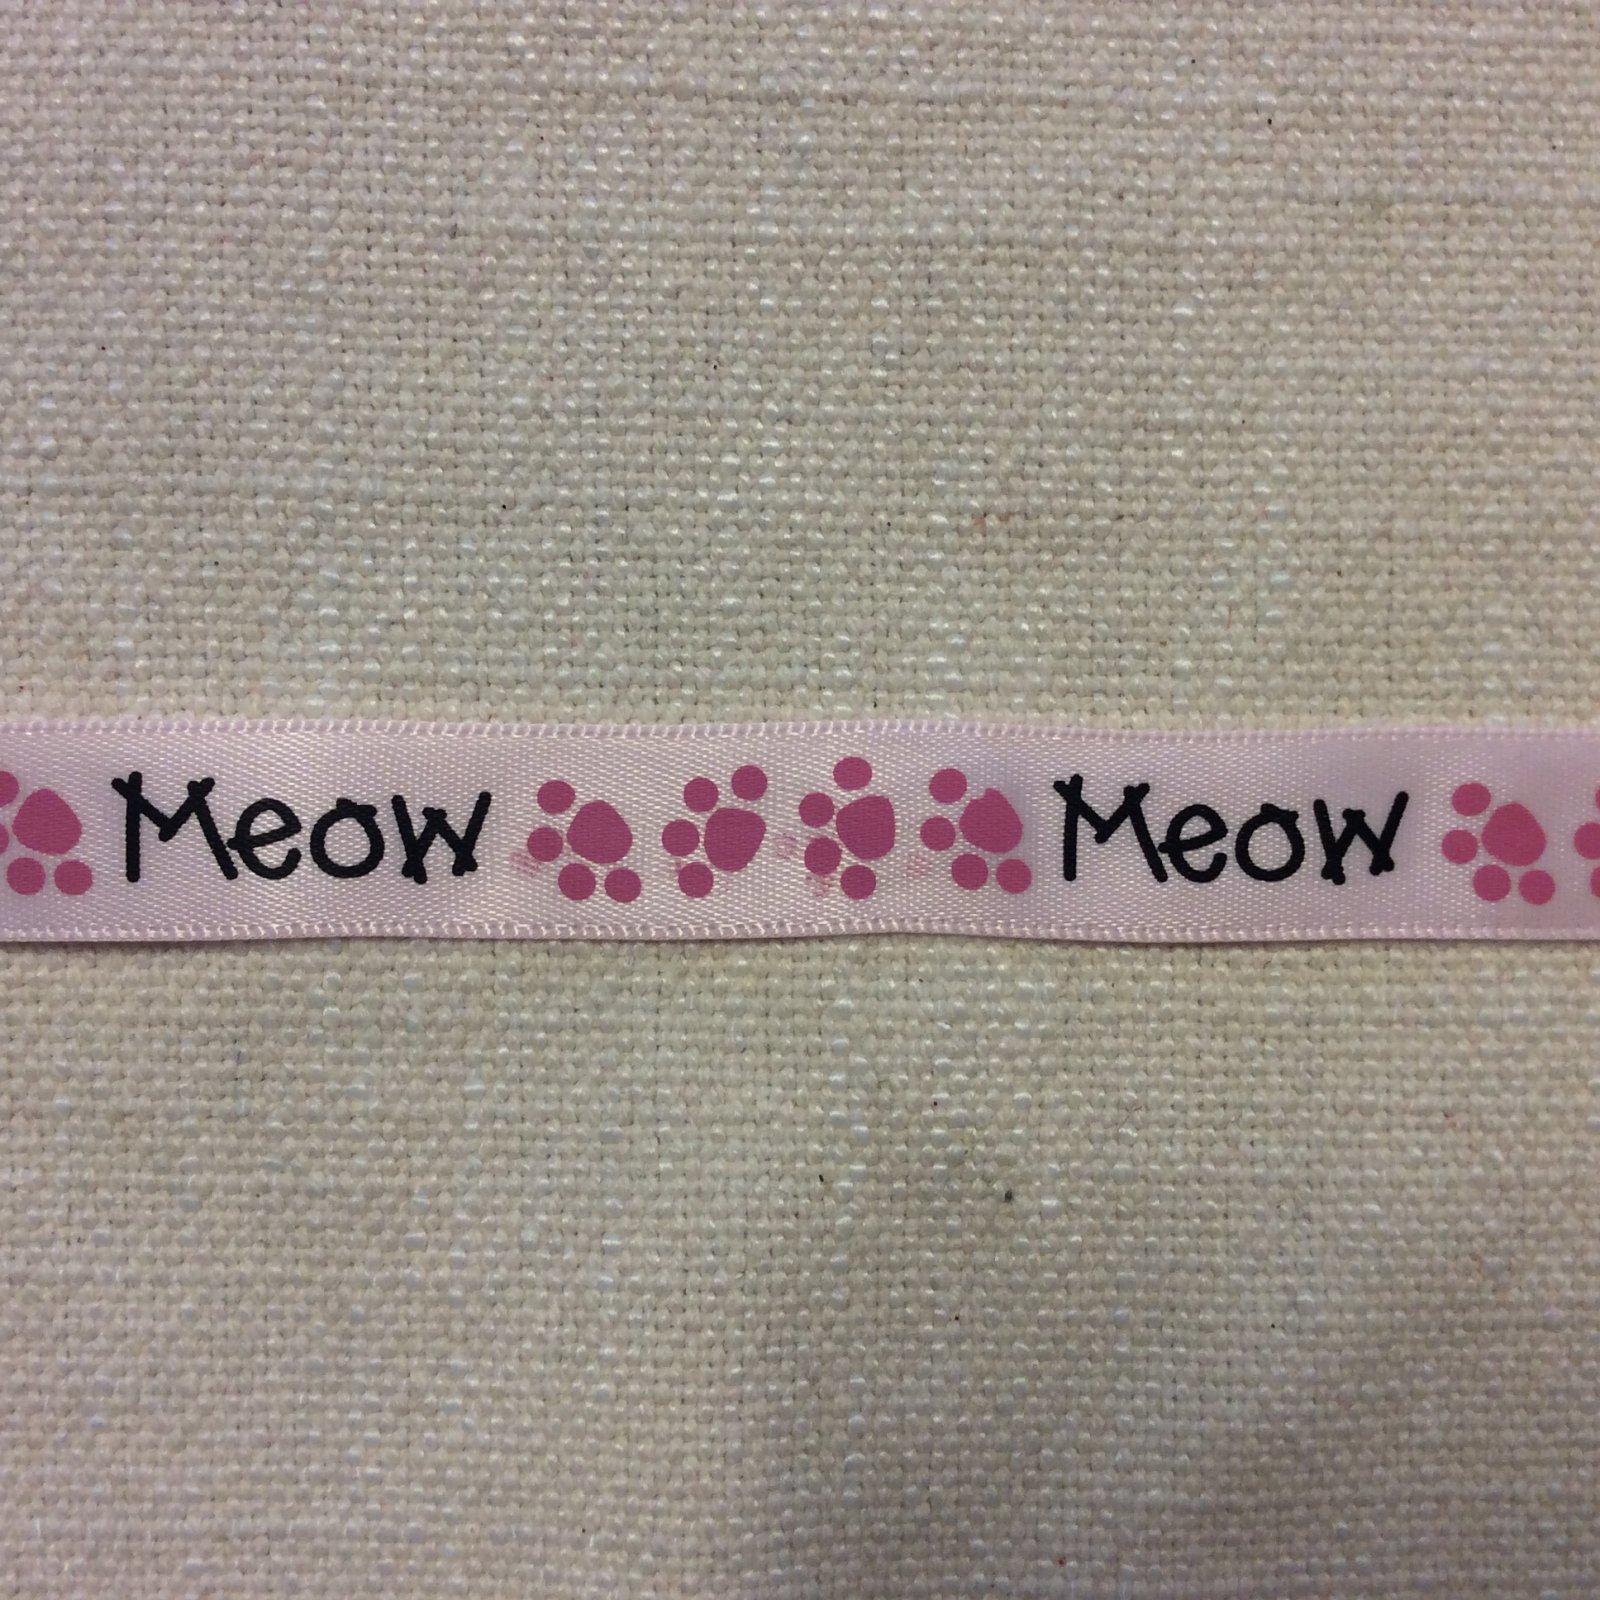 Satin Ribbon 5/8 Meow Cat Pawprint Trim Ribbon RIB1266